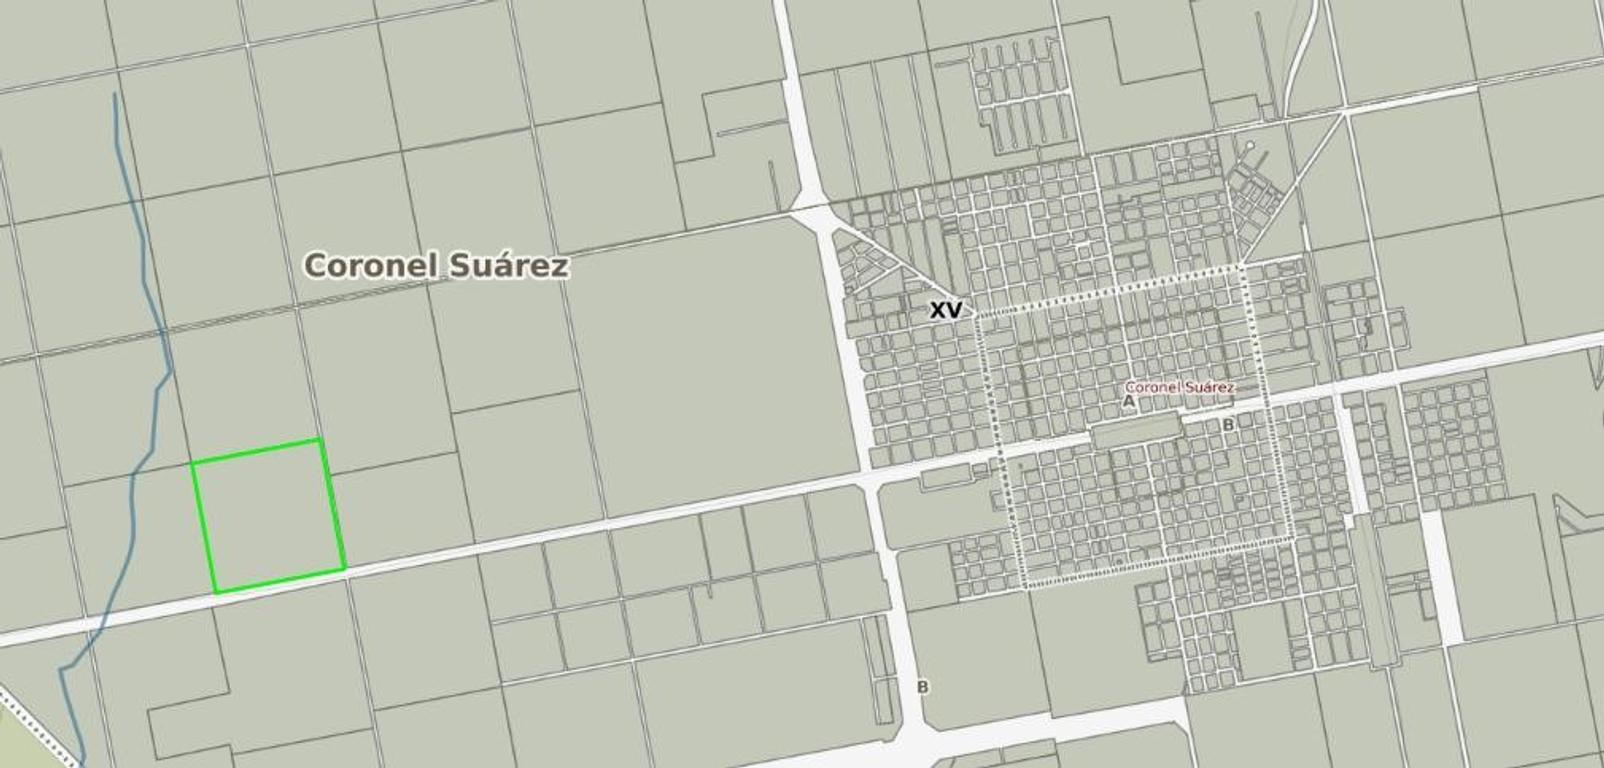 XINTEL(MEP-MEP-2116) Campo - Venta - Argentina, Coronel Suárez